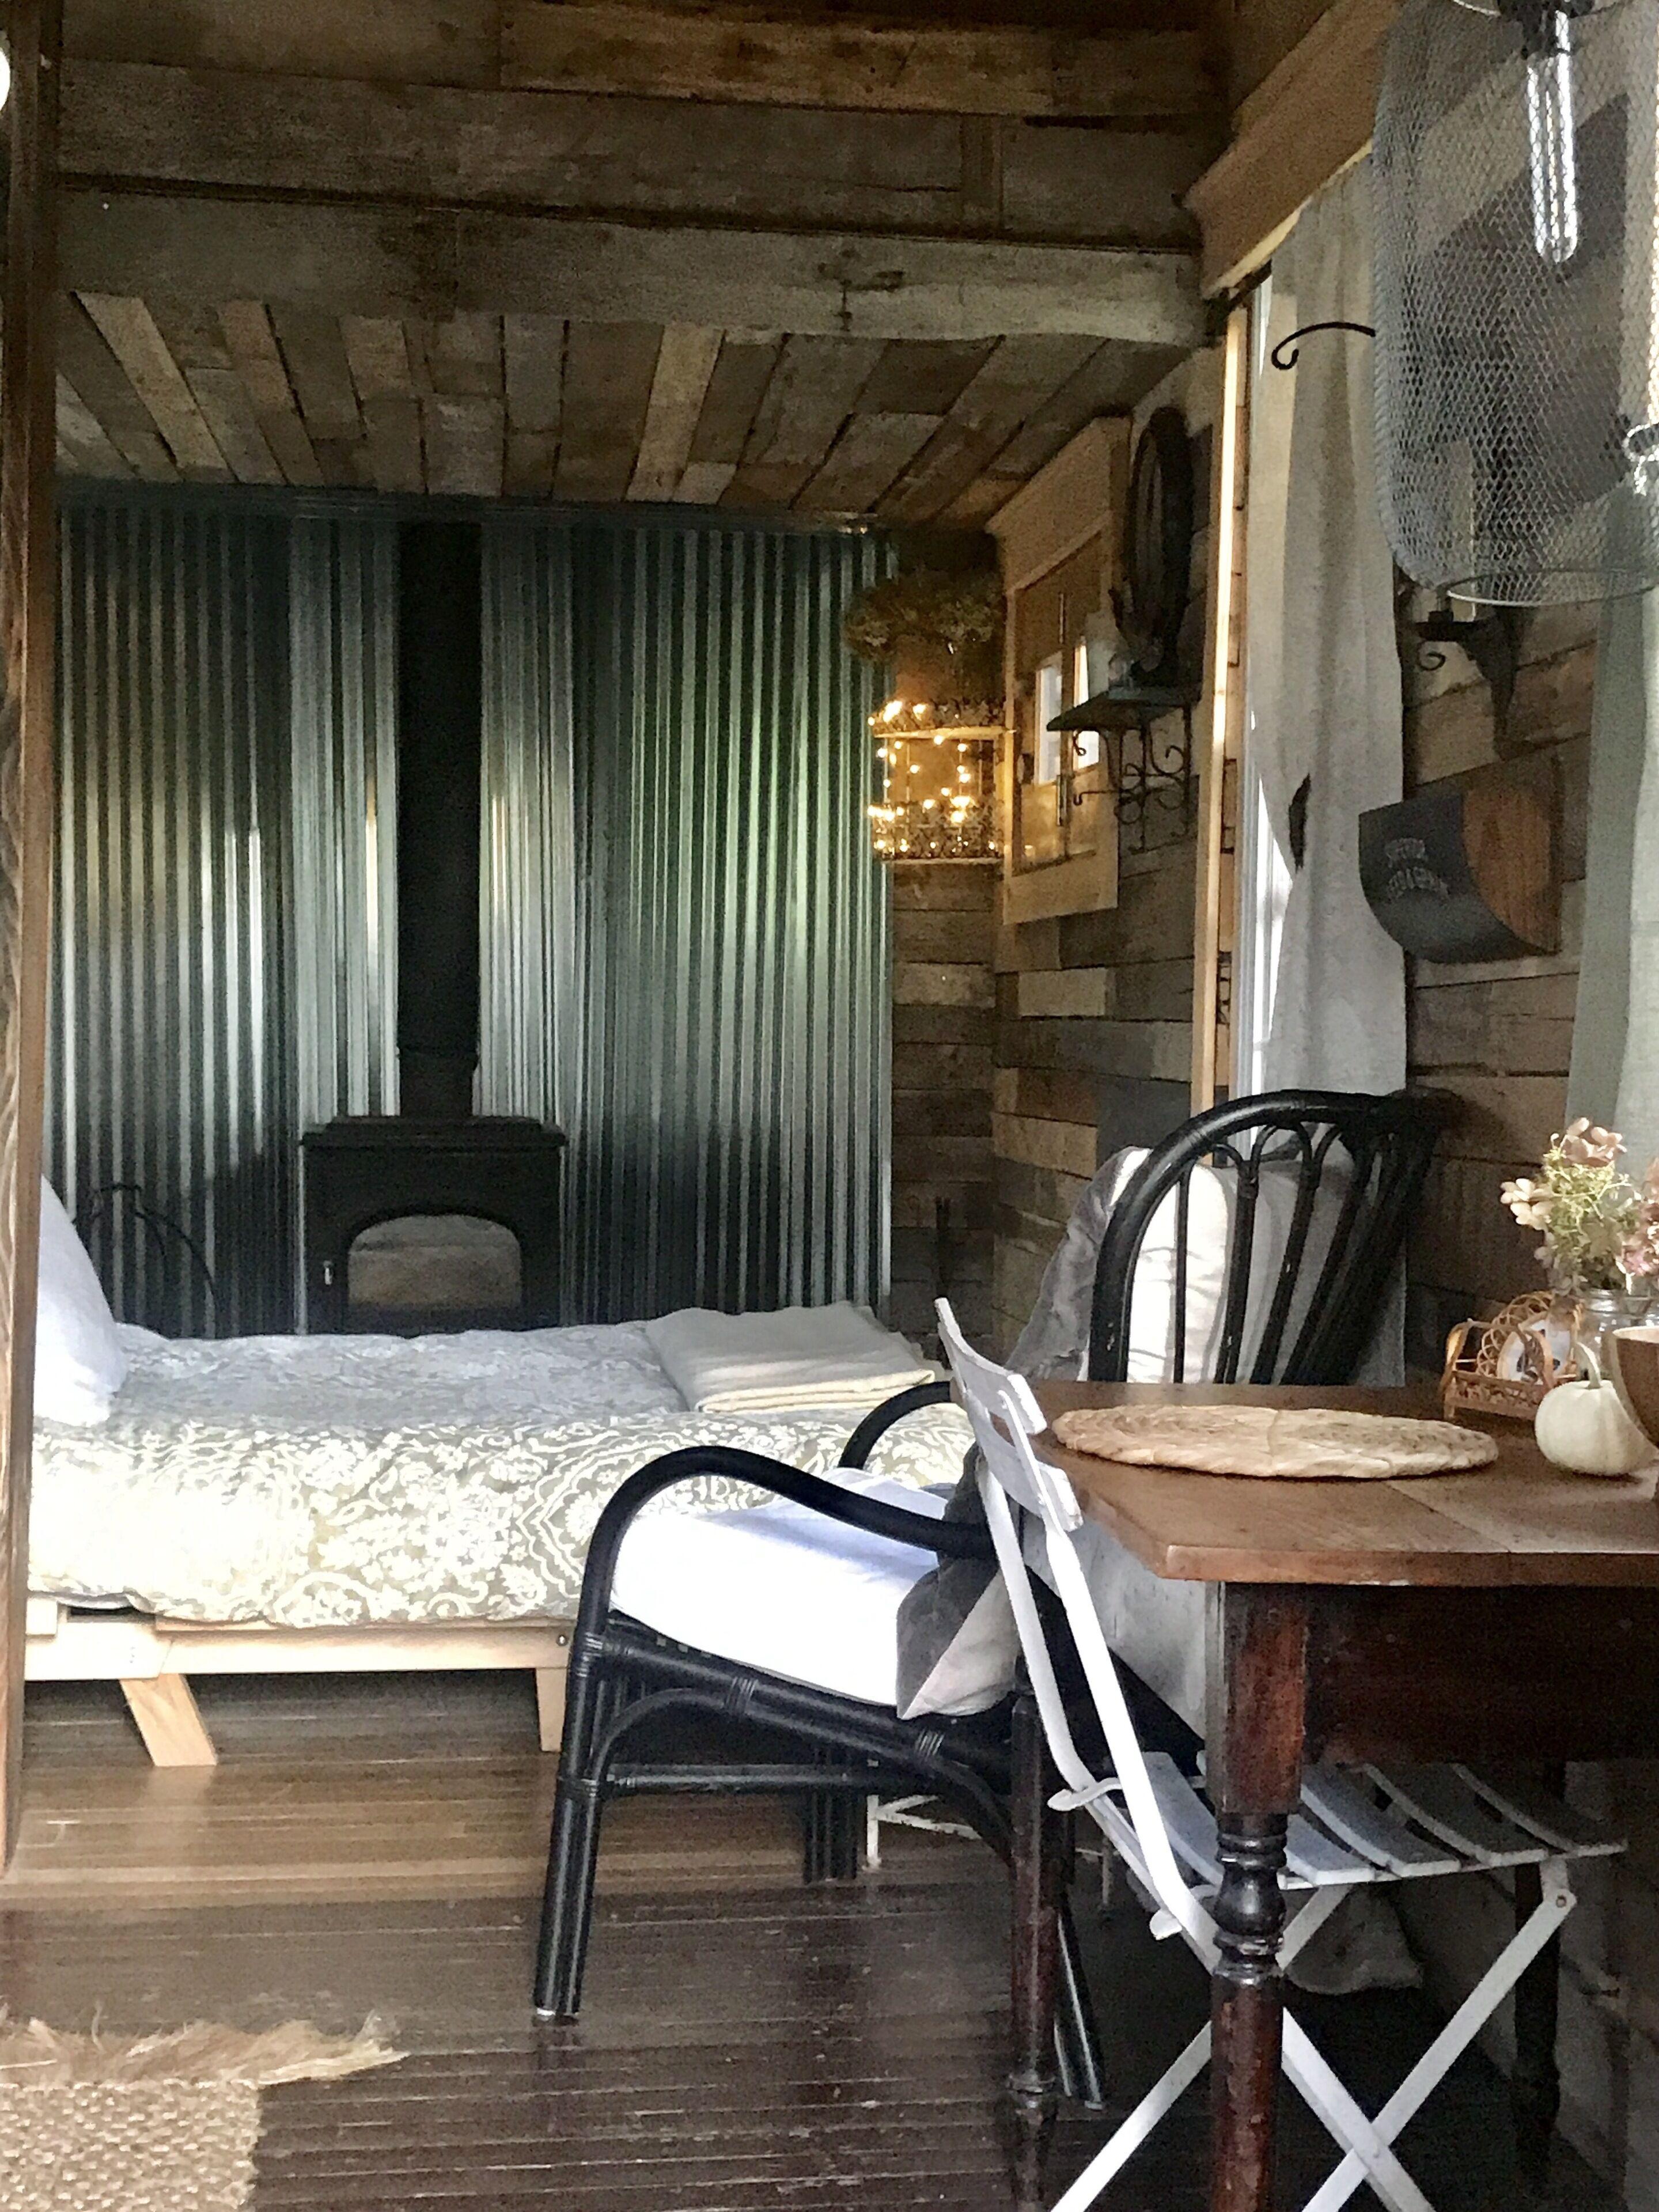 The Wanderers Cozy Tiny House Off Grid Cabin On Wheels Argyle Usa Expedia Com Au